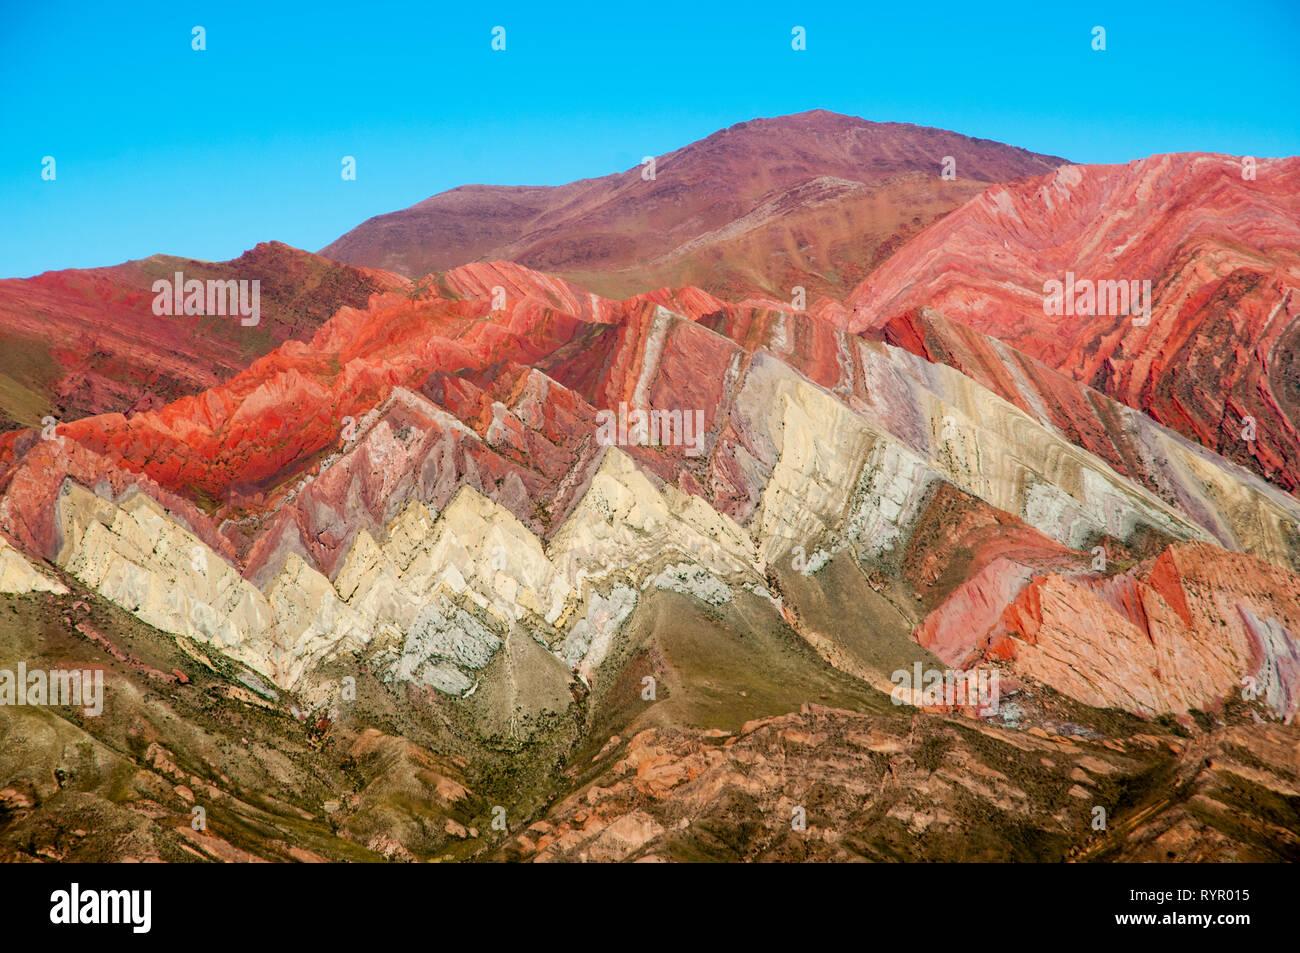 Serrania del Hornocal - Jujuy - Argentina - Stock Image